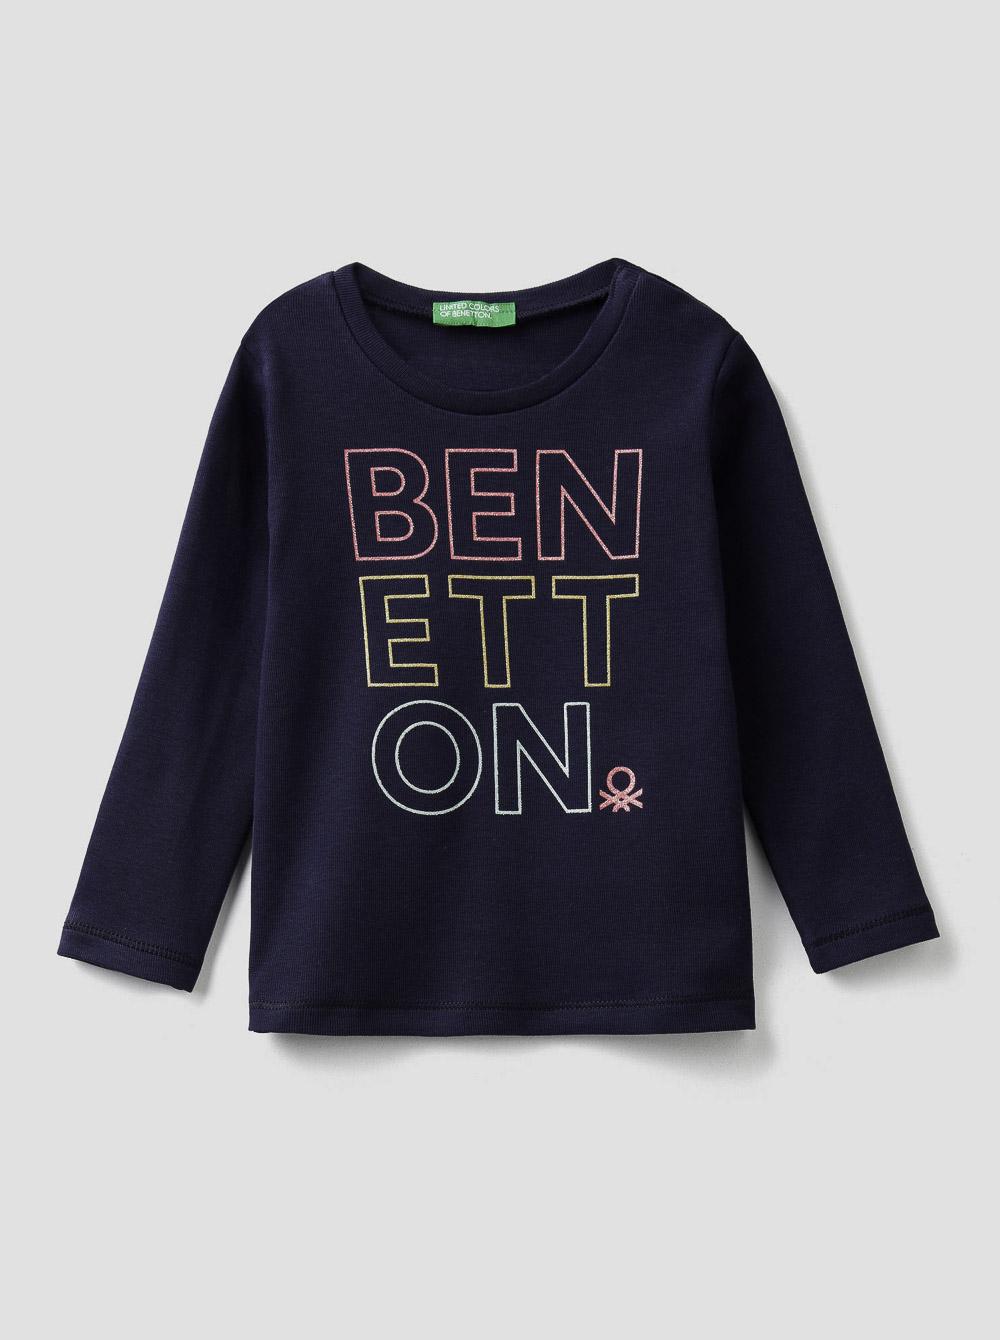 012 BENETTON T-shirt μακρυμάνικο με λογότυπο 3I9WC14QX 20A252